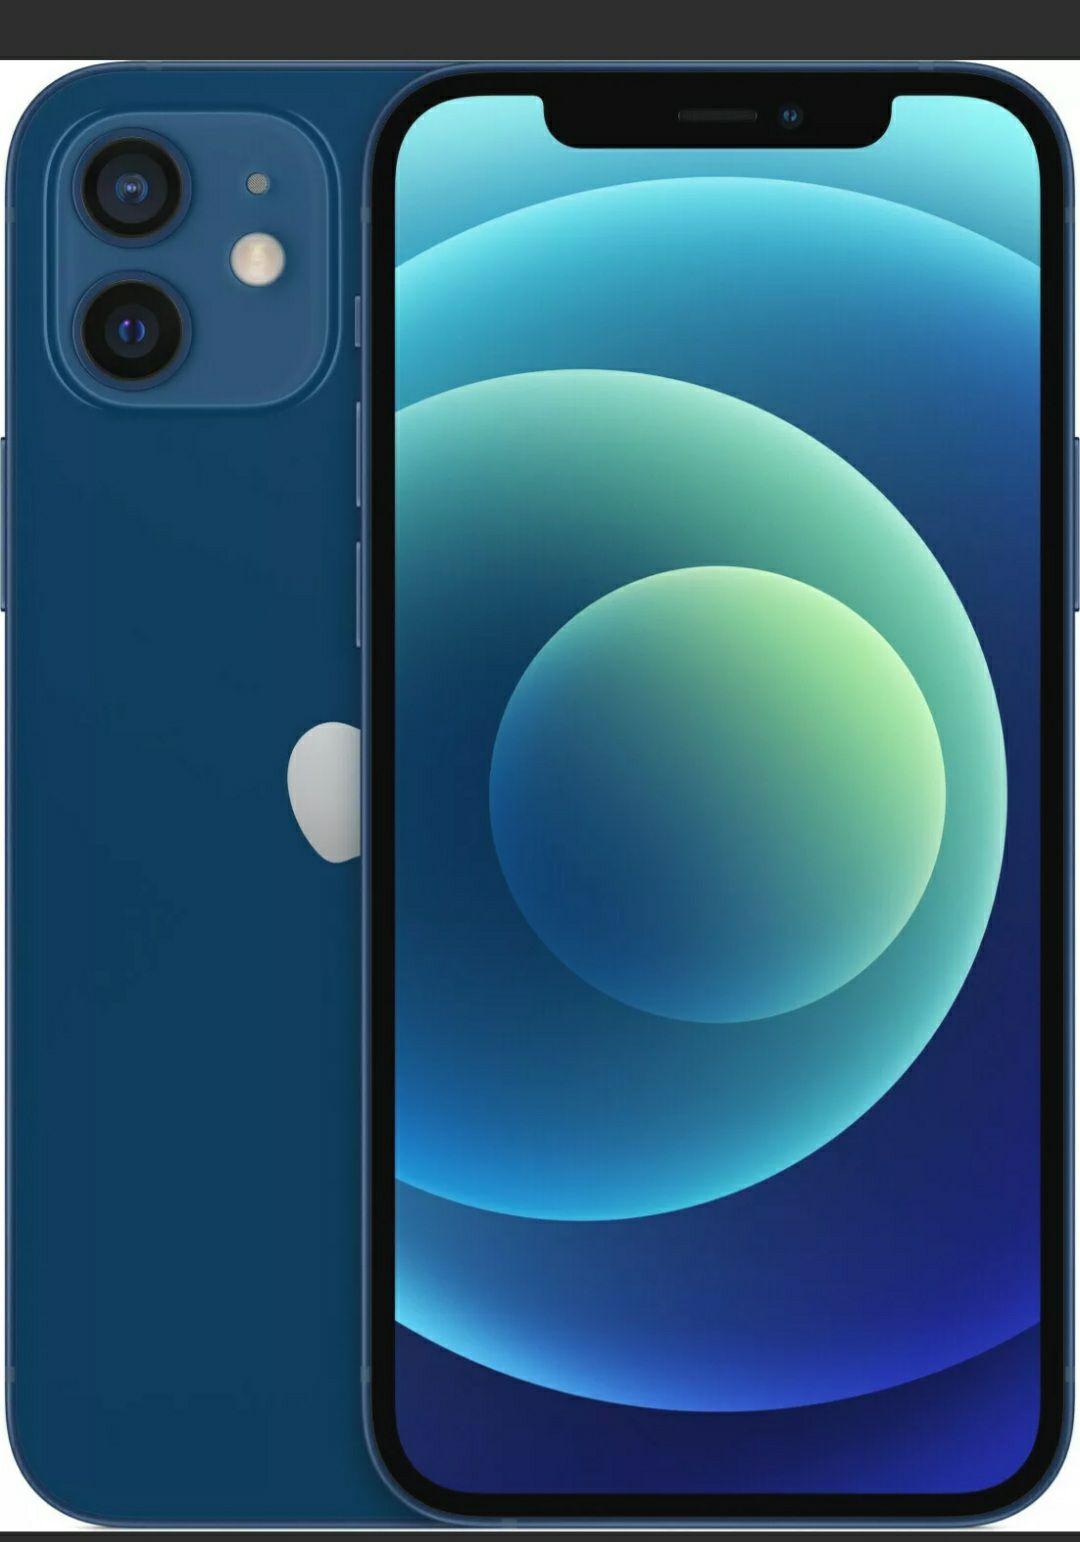 Iphone 12 Mini 64GB Blau bei Ebay (Differenzbesteuert)